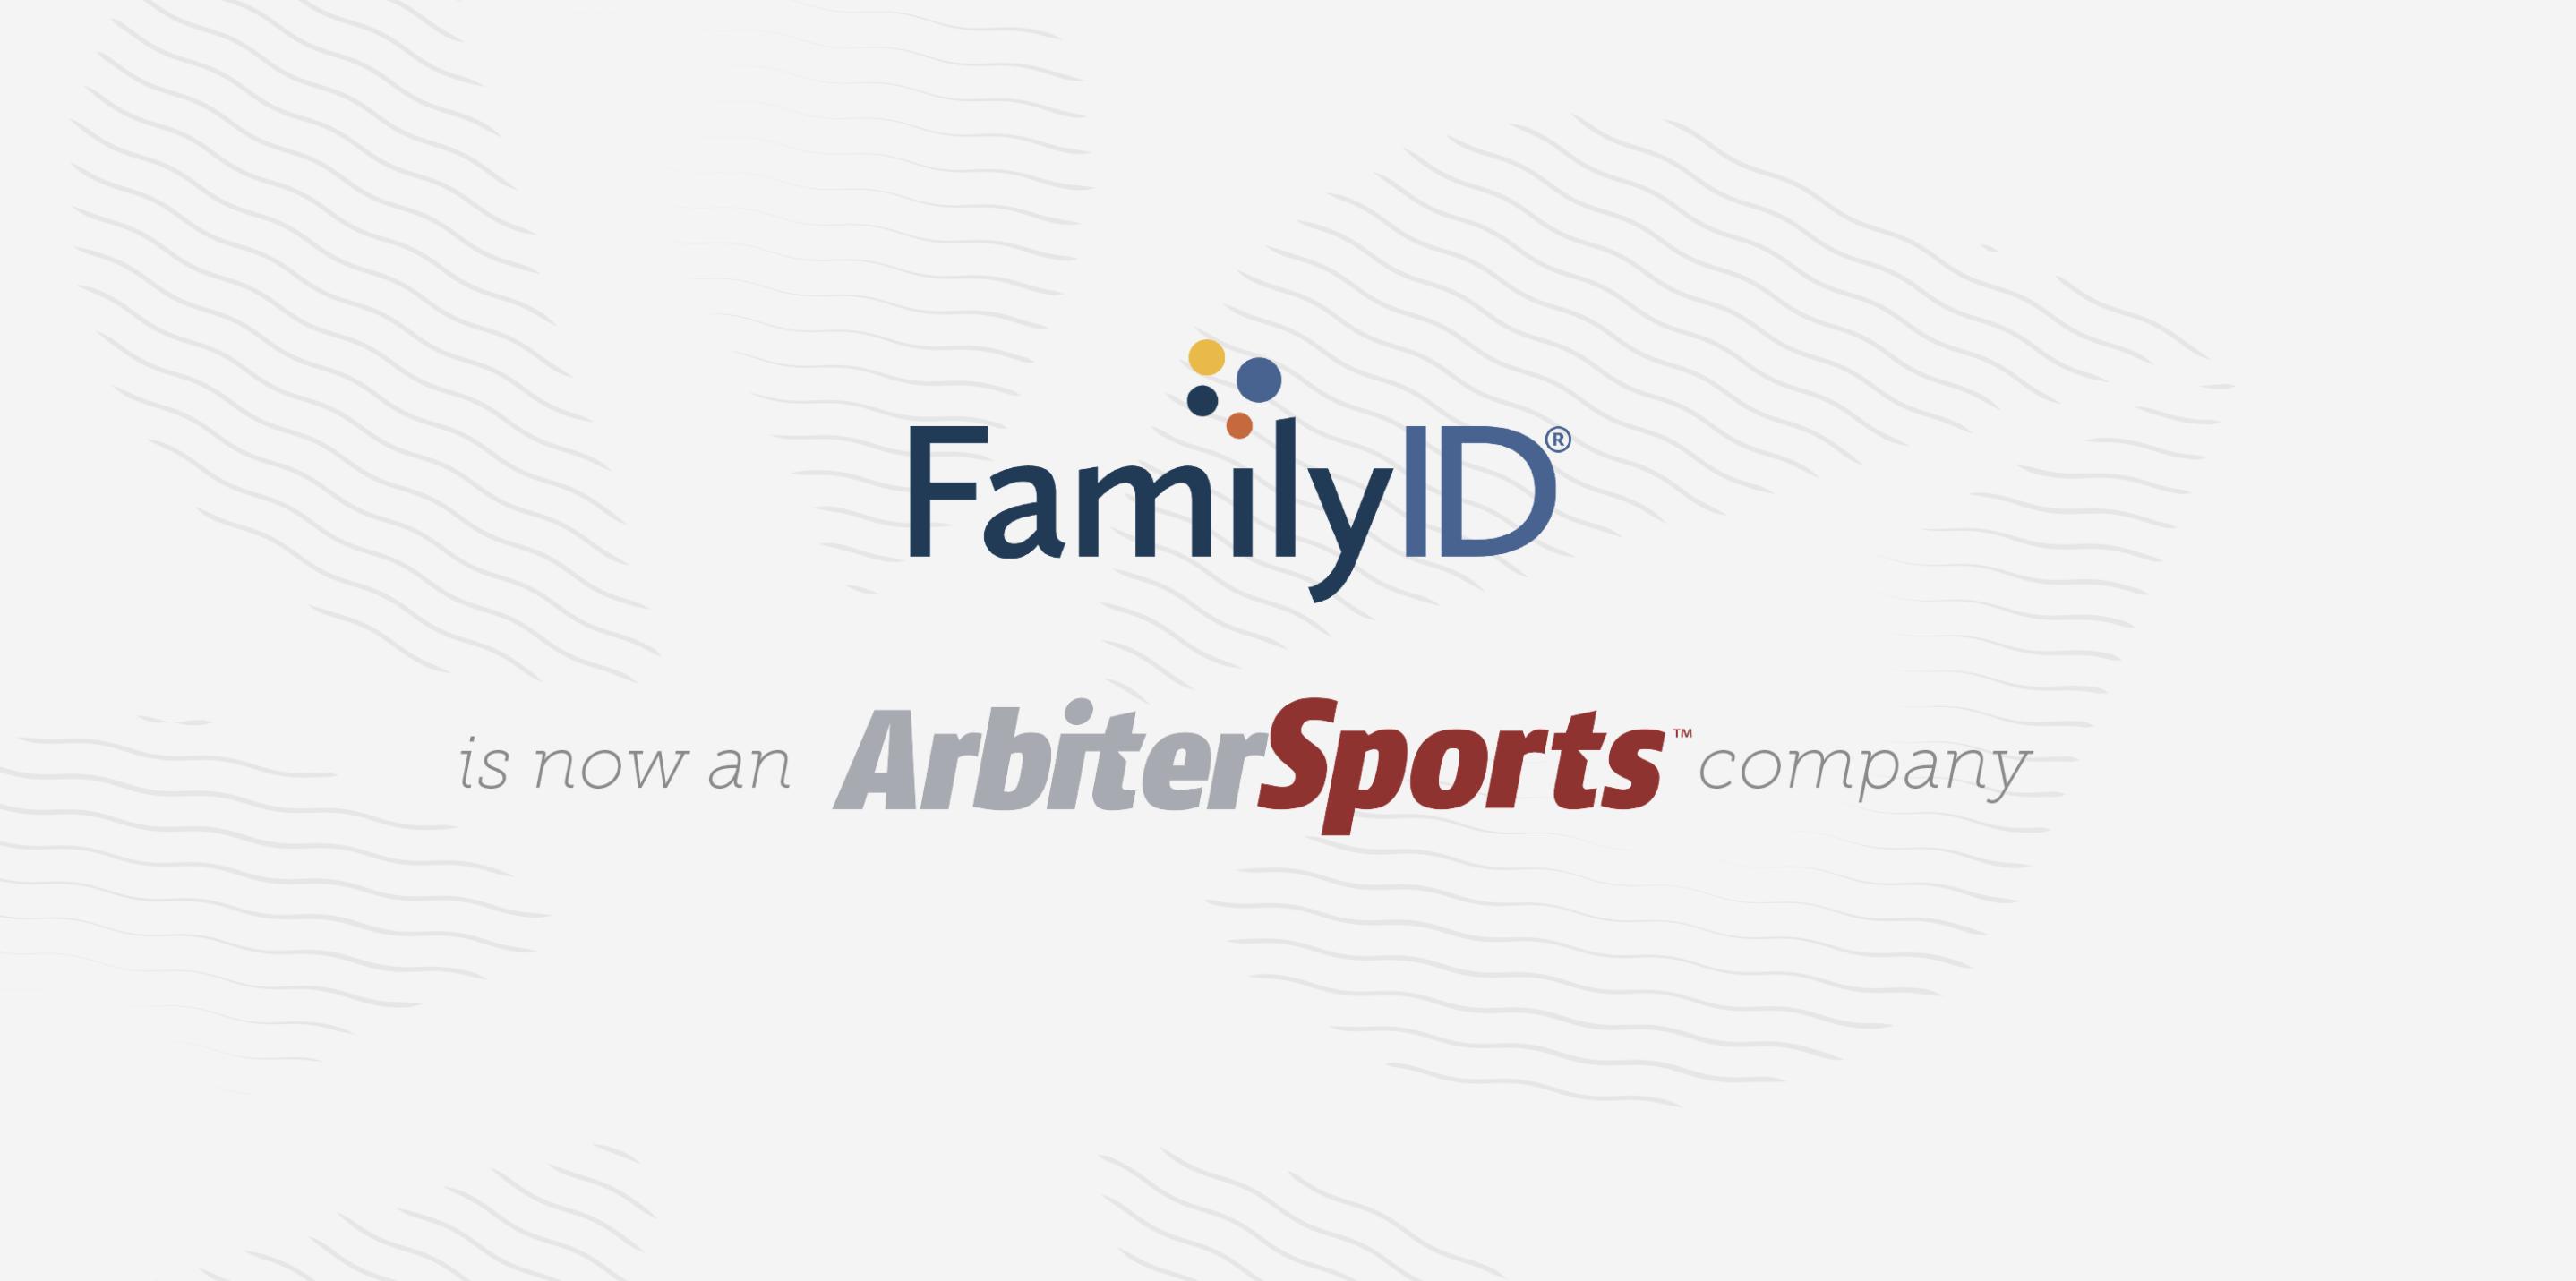 Serent Capital Portfolio Company ArbiterSports Announces Acquisition of FamilyID